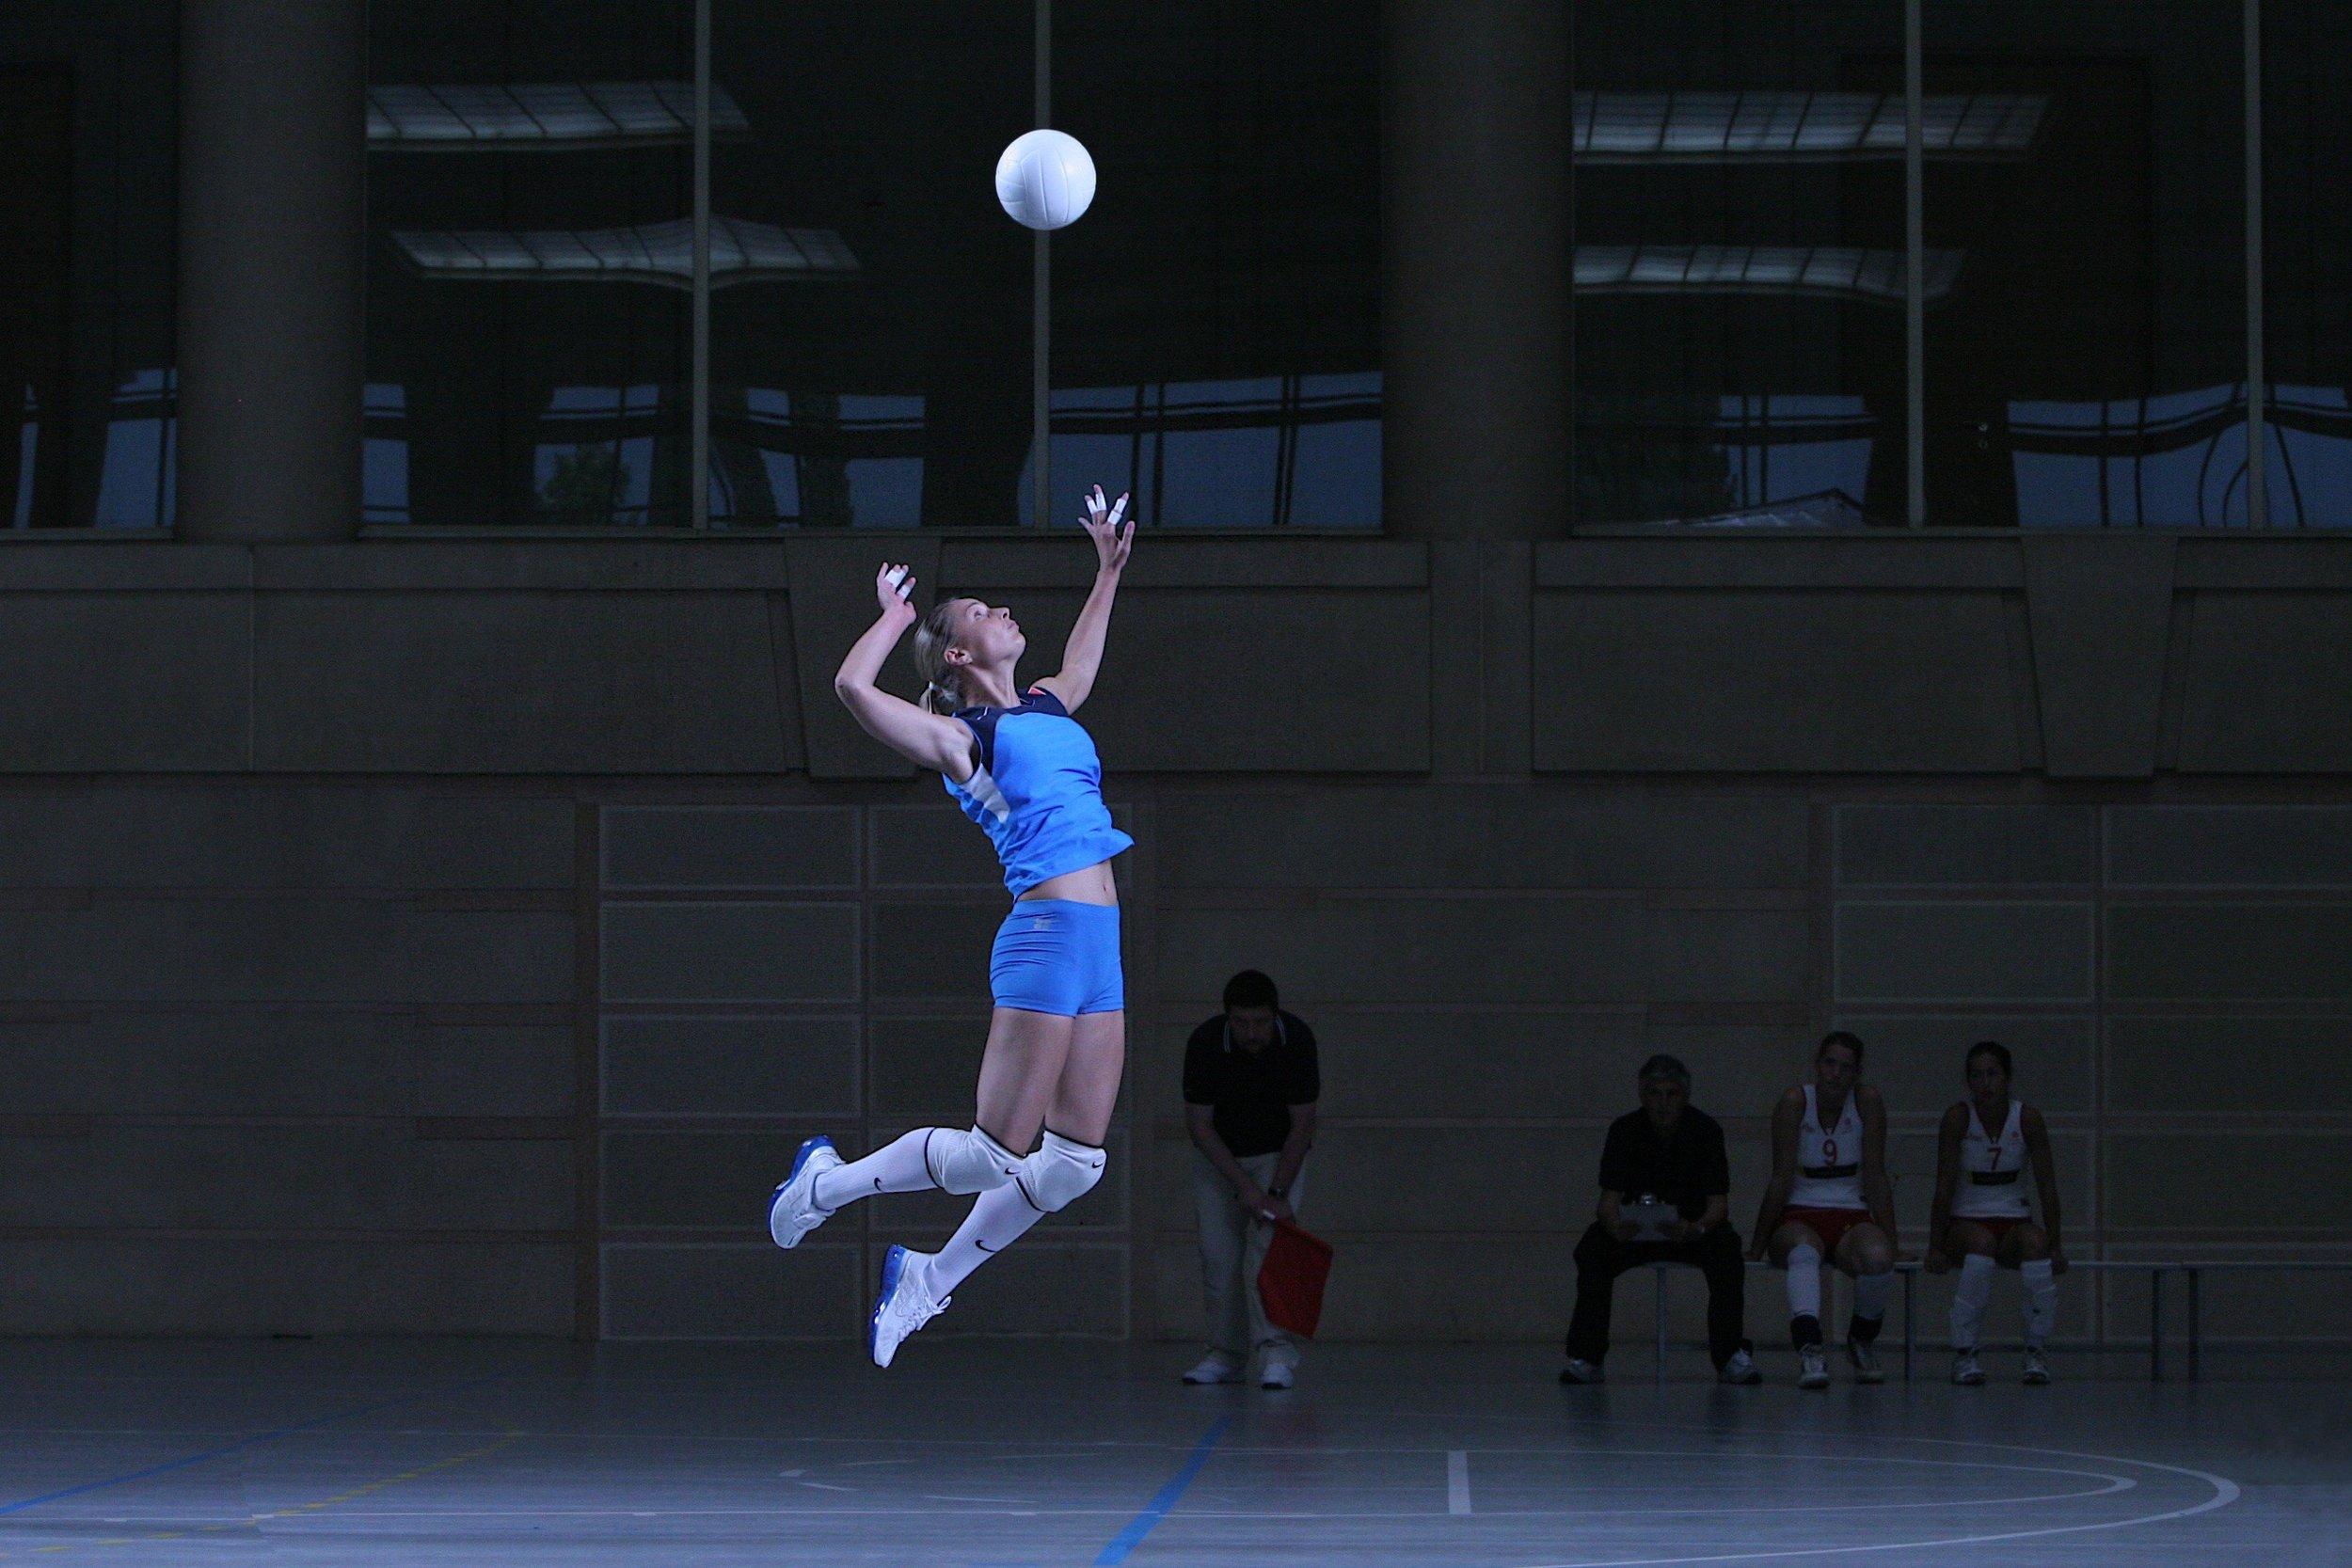 Nike Defy Volleyball.jpg